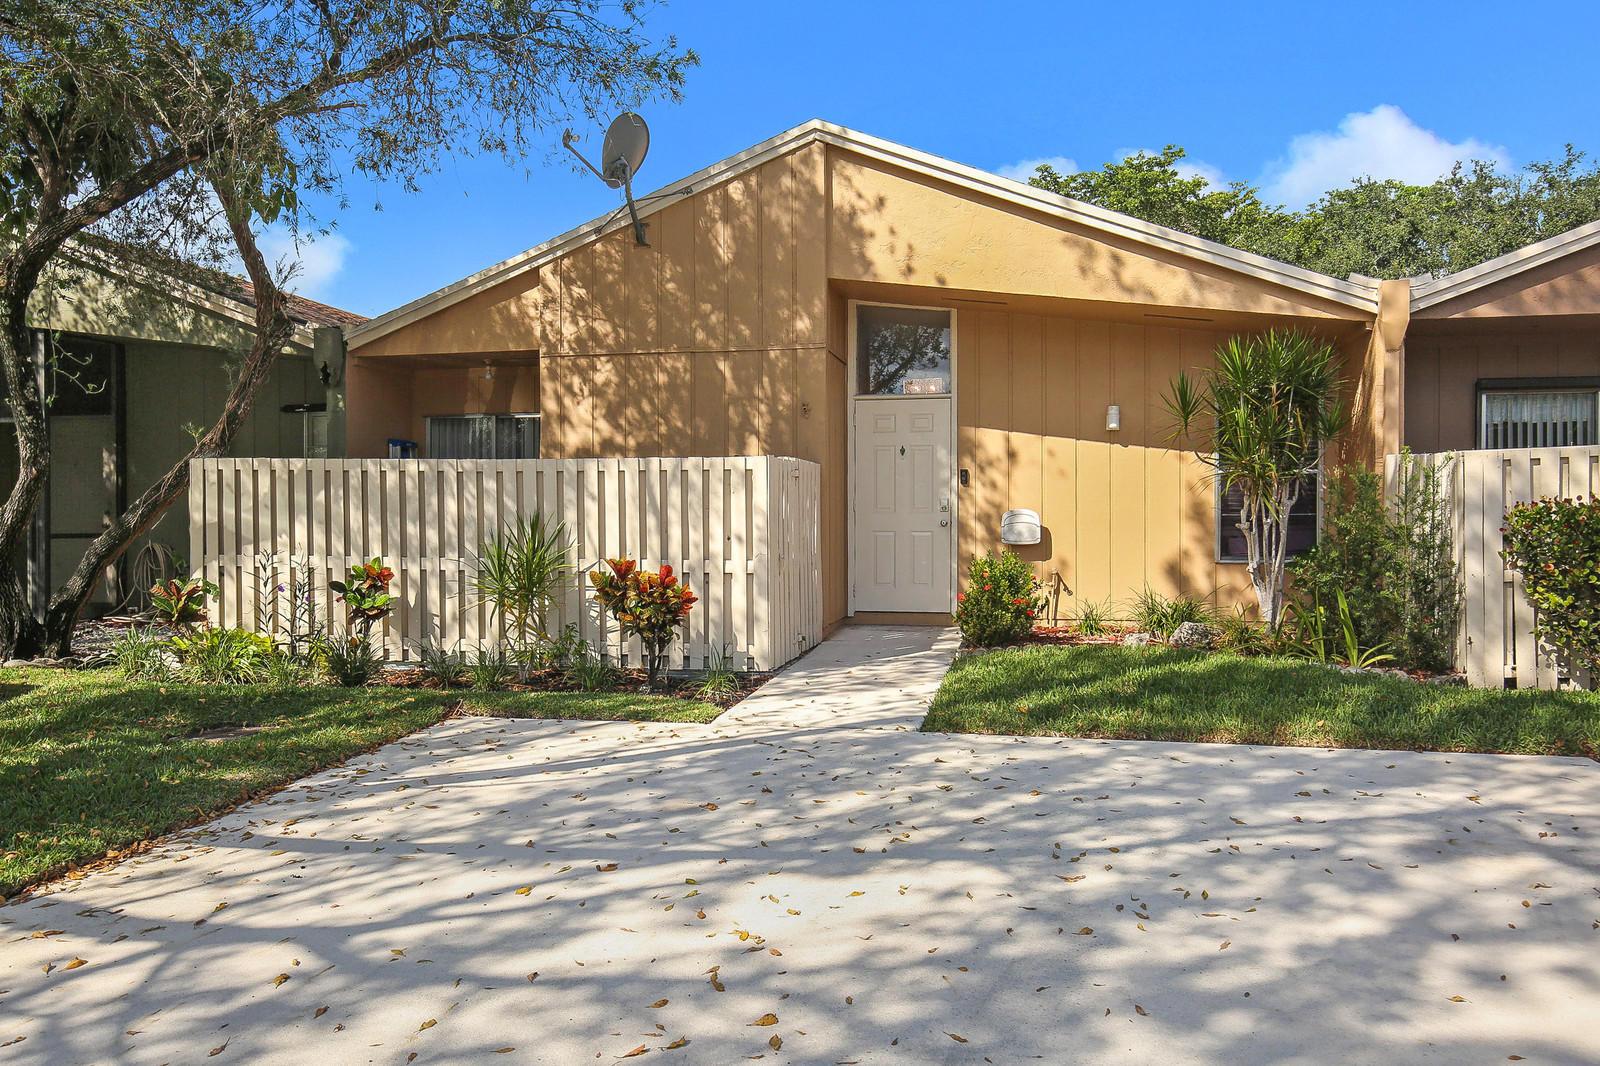 22291 Misty Woods Way Boca Raton, FL 33428